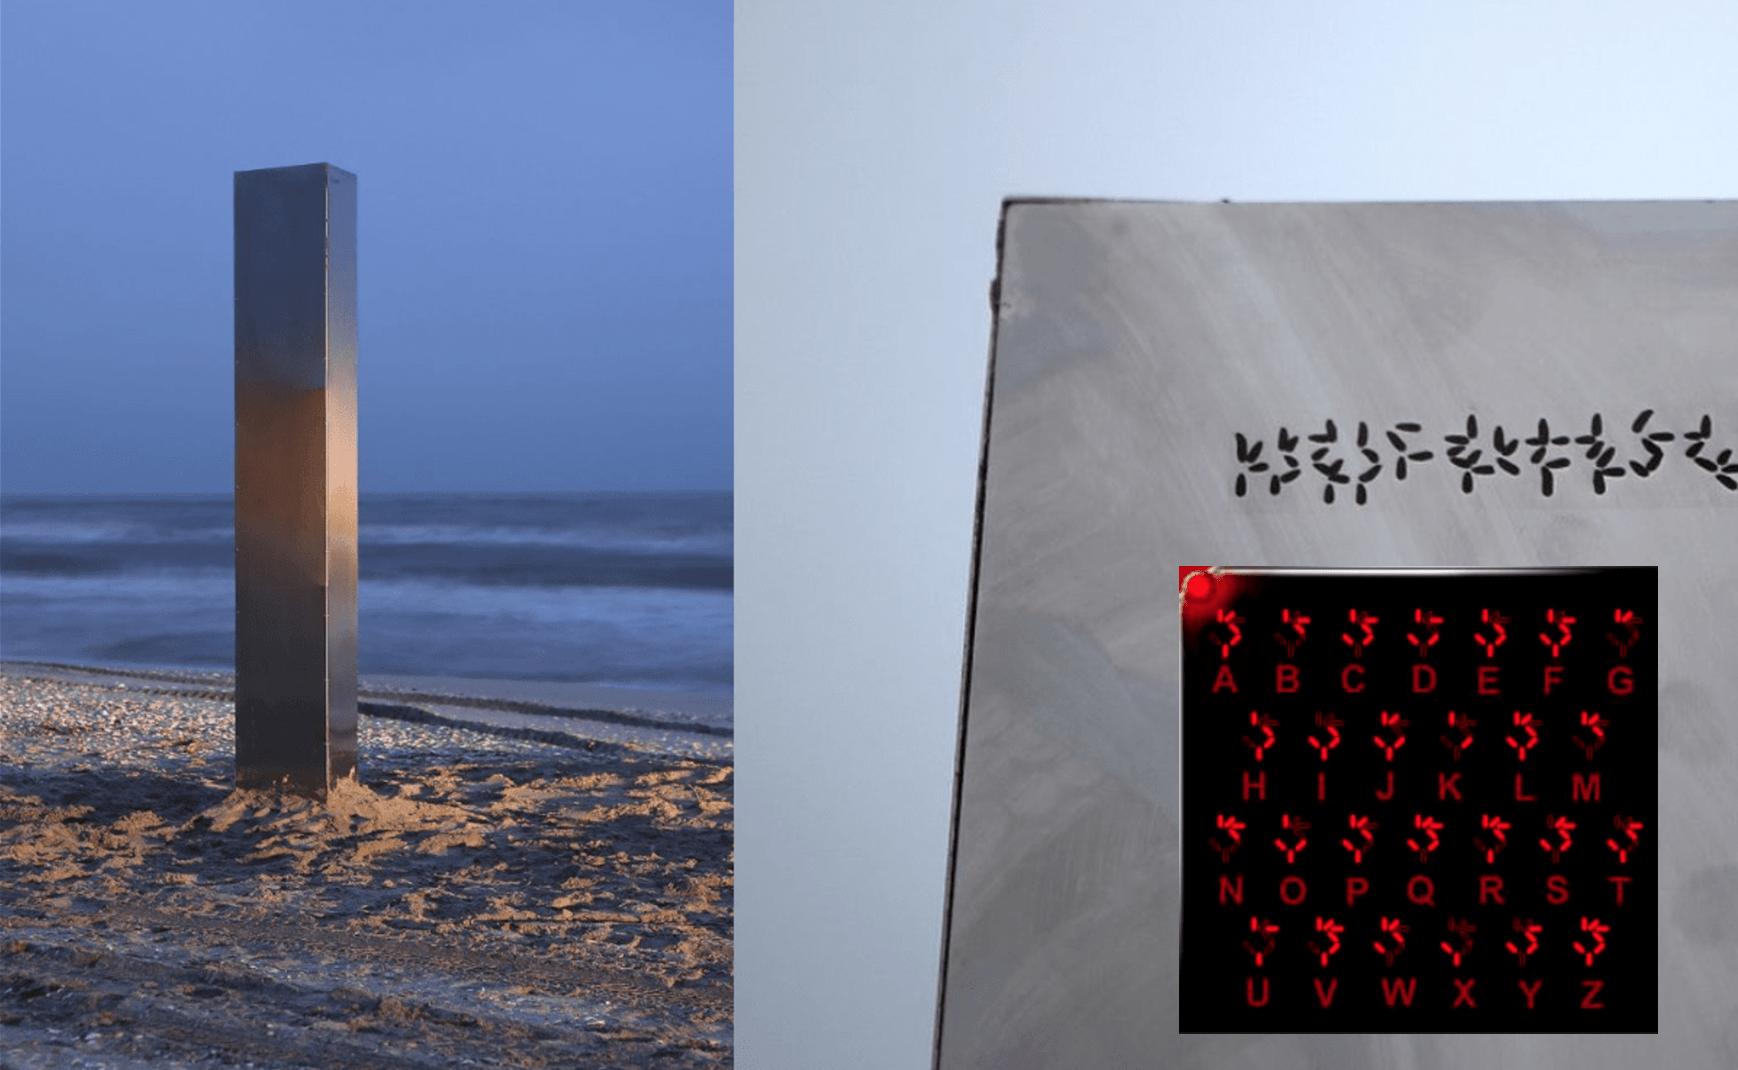 Primul monolit care contine un mesaj codificat gasit in Constanta, pe plaja ( AM DESCIFRAT MESAJUL )